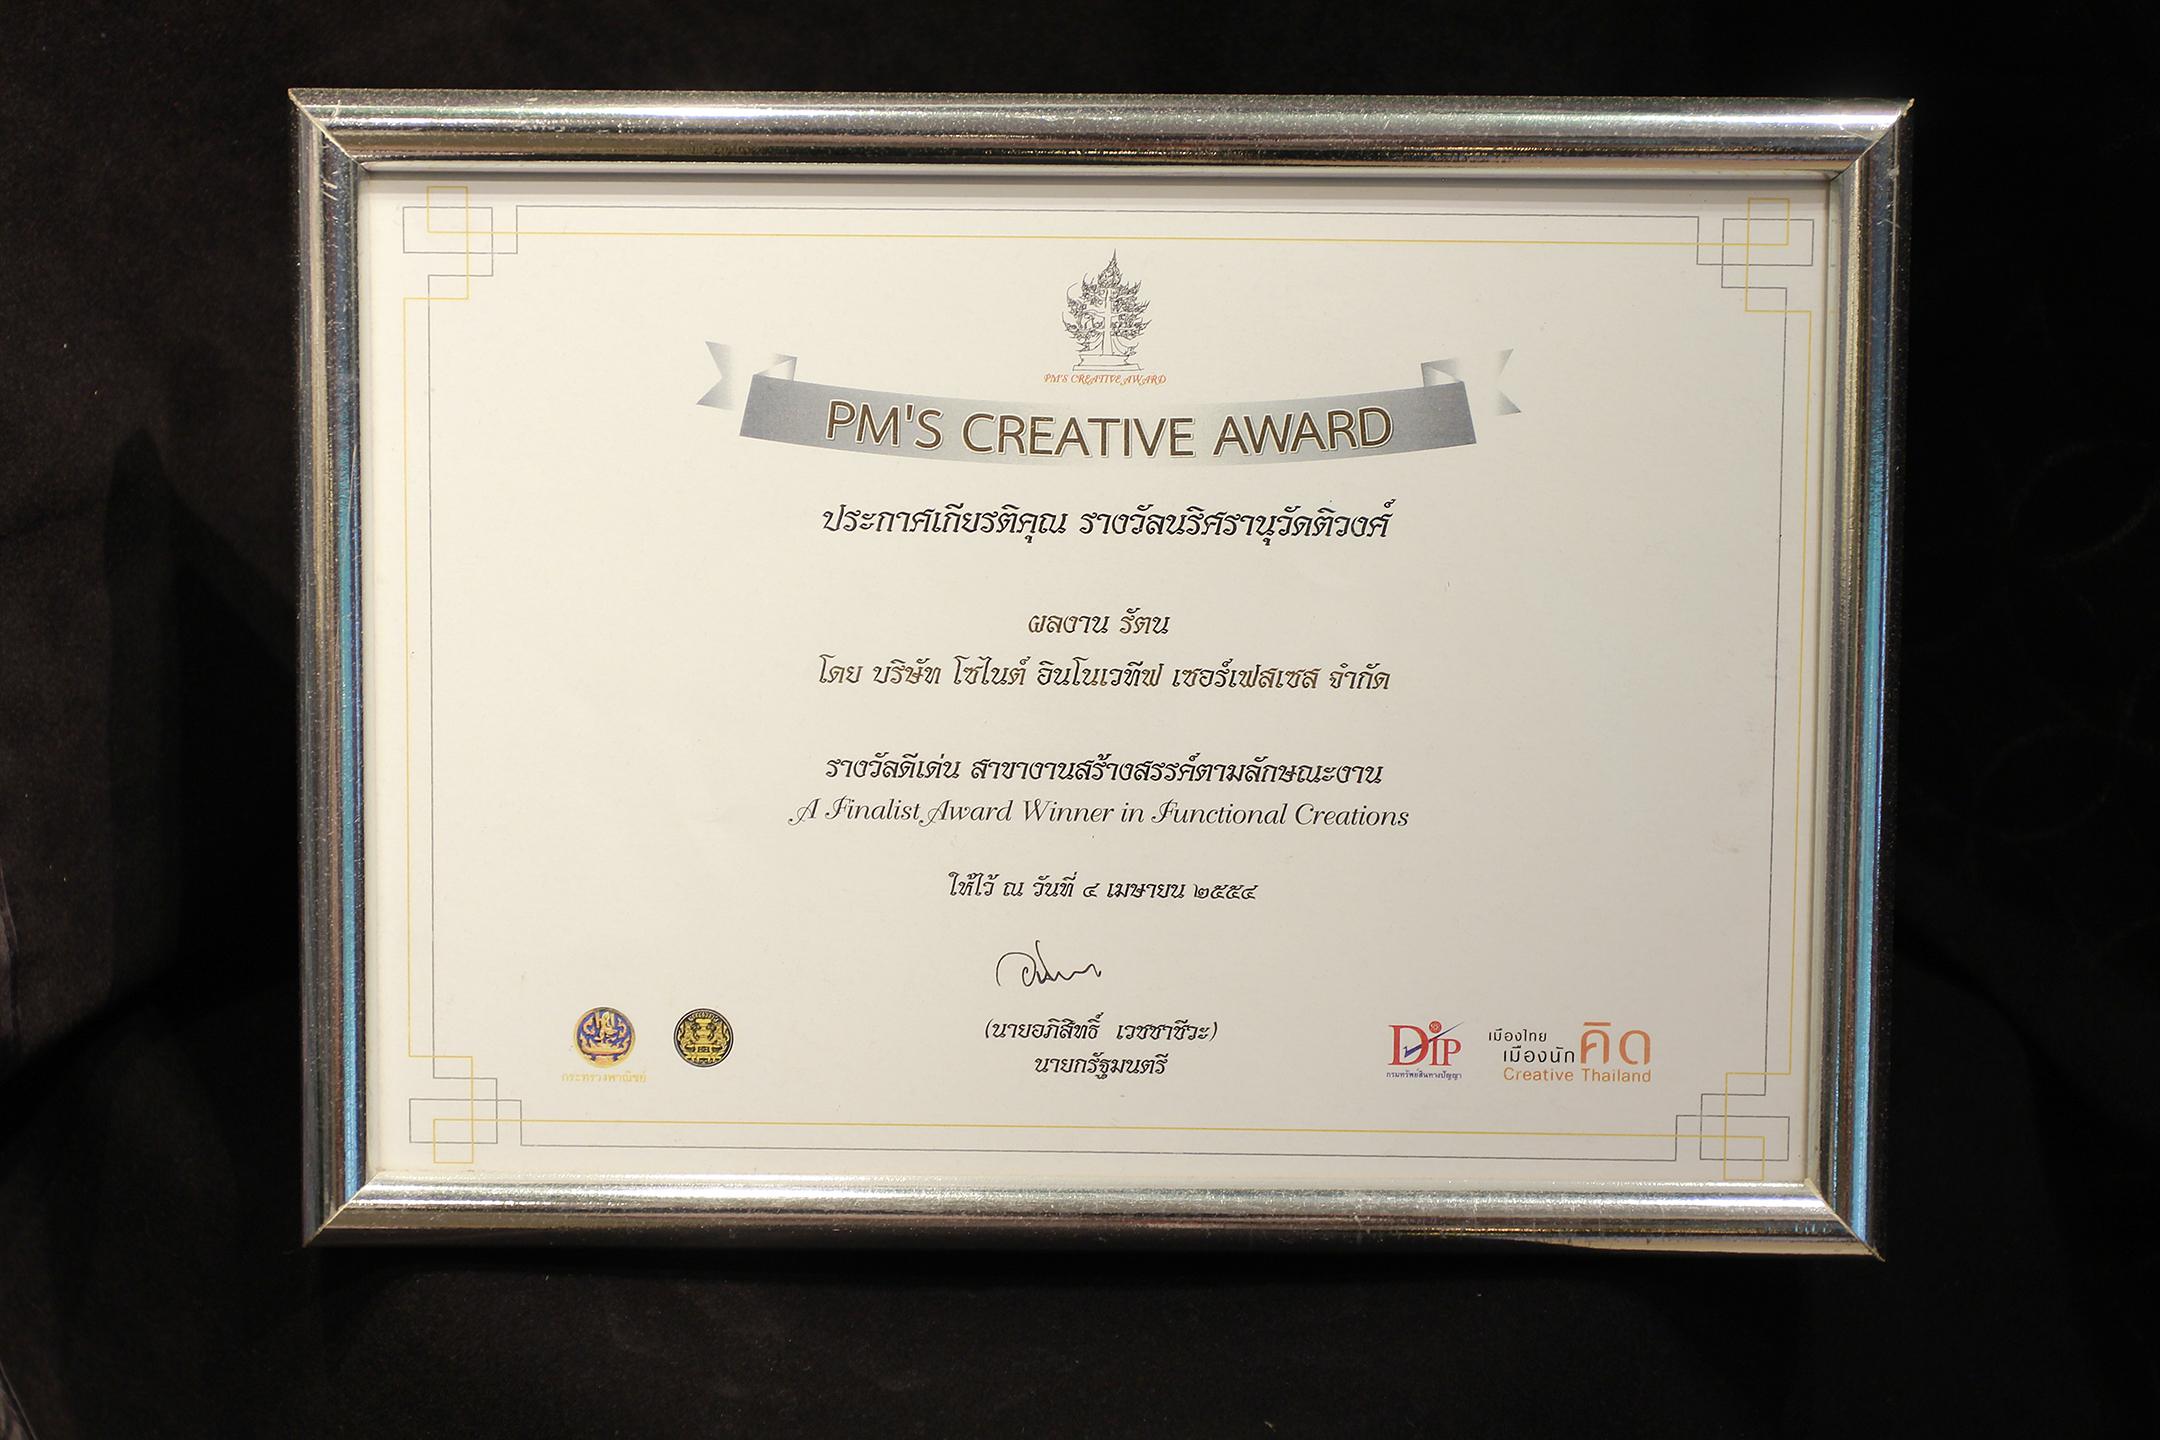 Prime Minister Creative Award